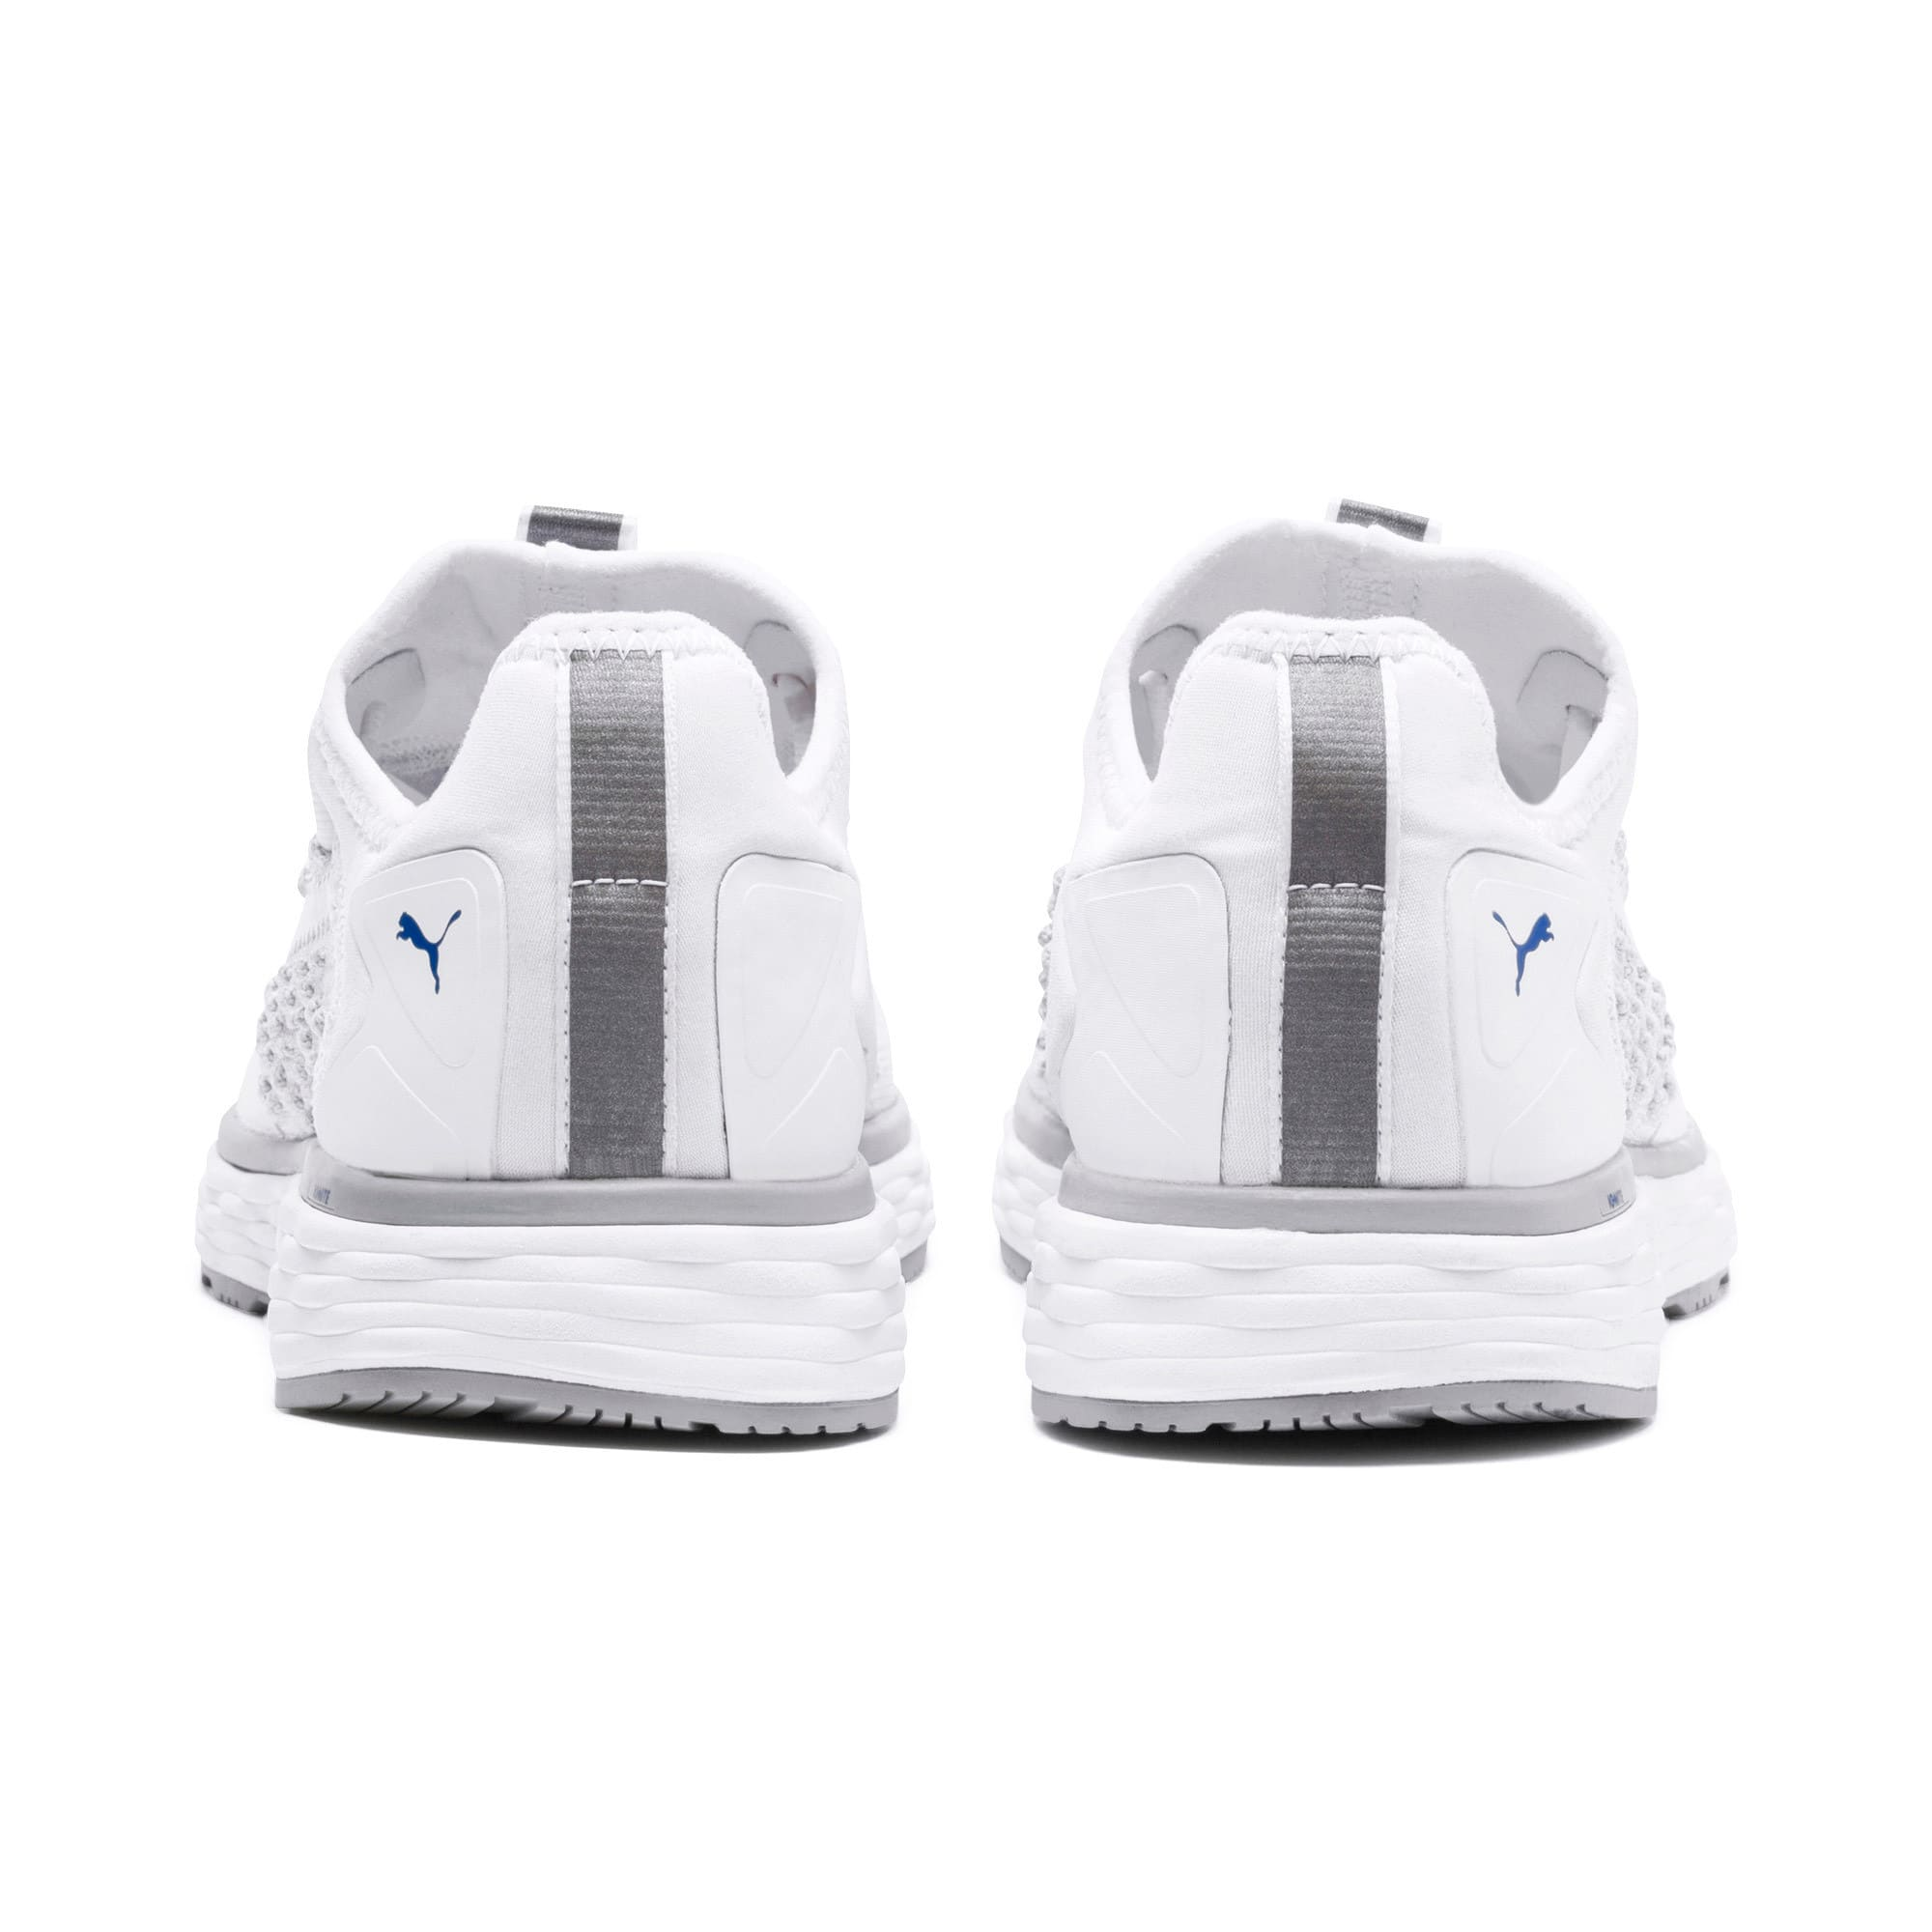 Thumbnail 5 of SPEED FUSEFIT Women's Running Shoes, Puma White-Quarry, medium-IND